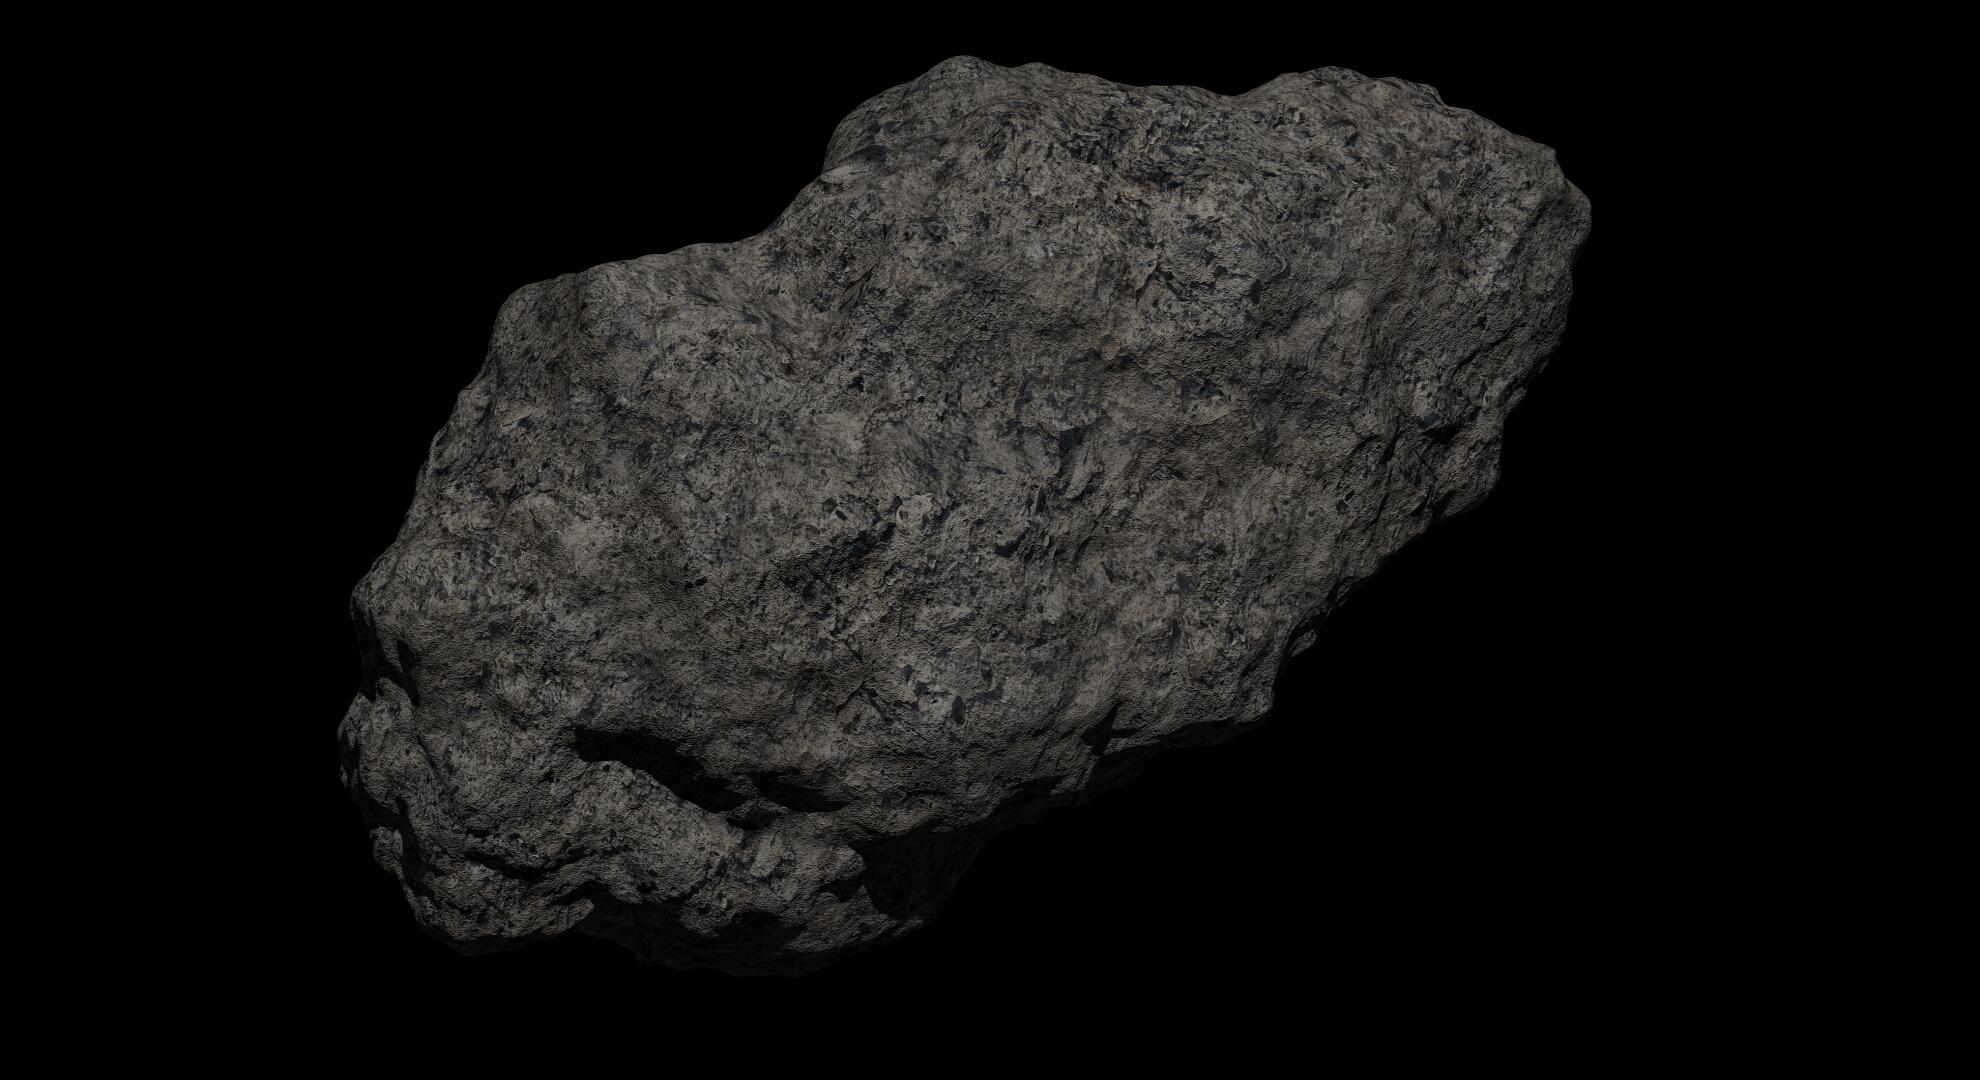 fantasy asteroid 2 3d model 3ds blend dae fbx obj 267191